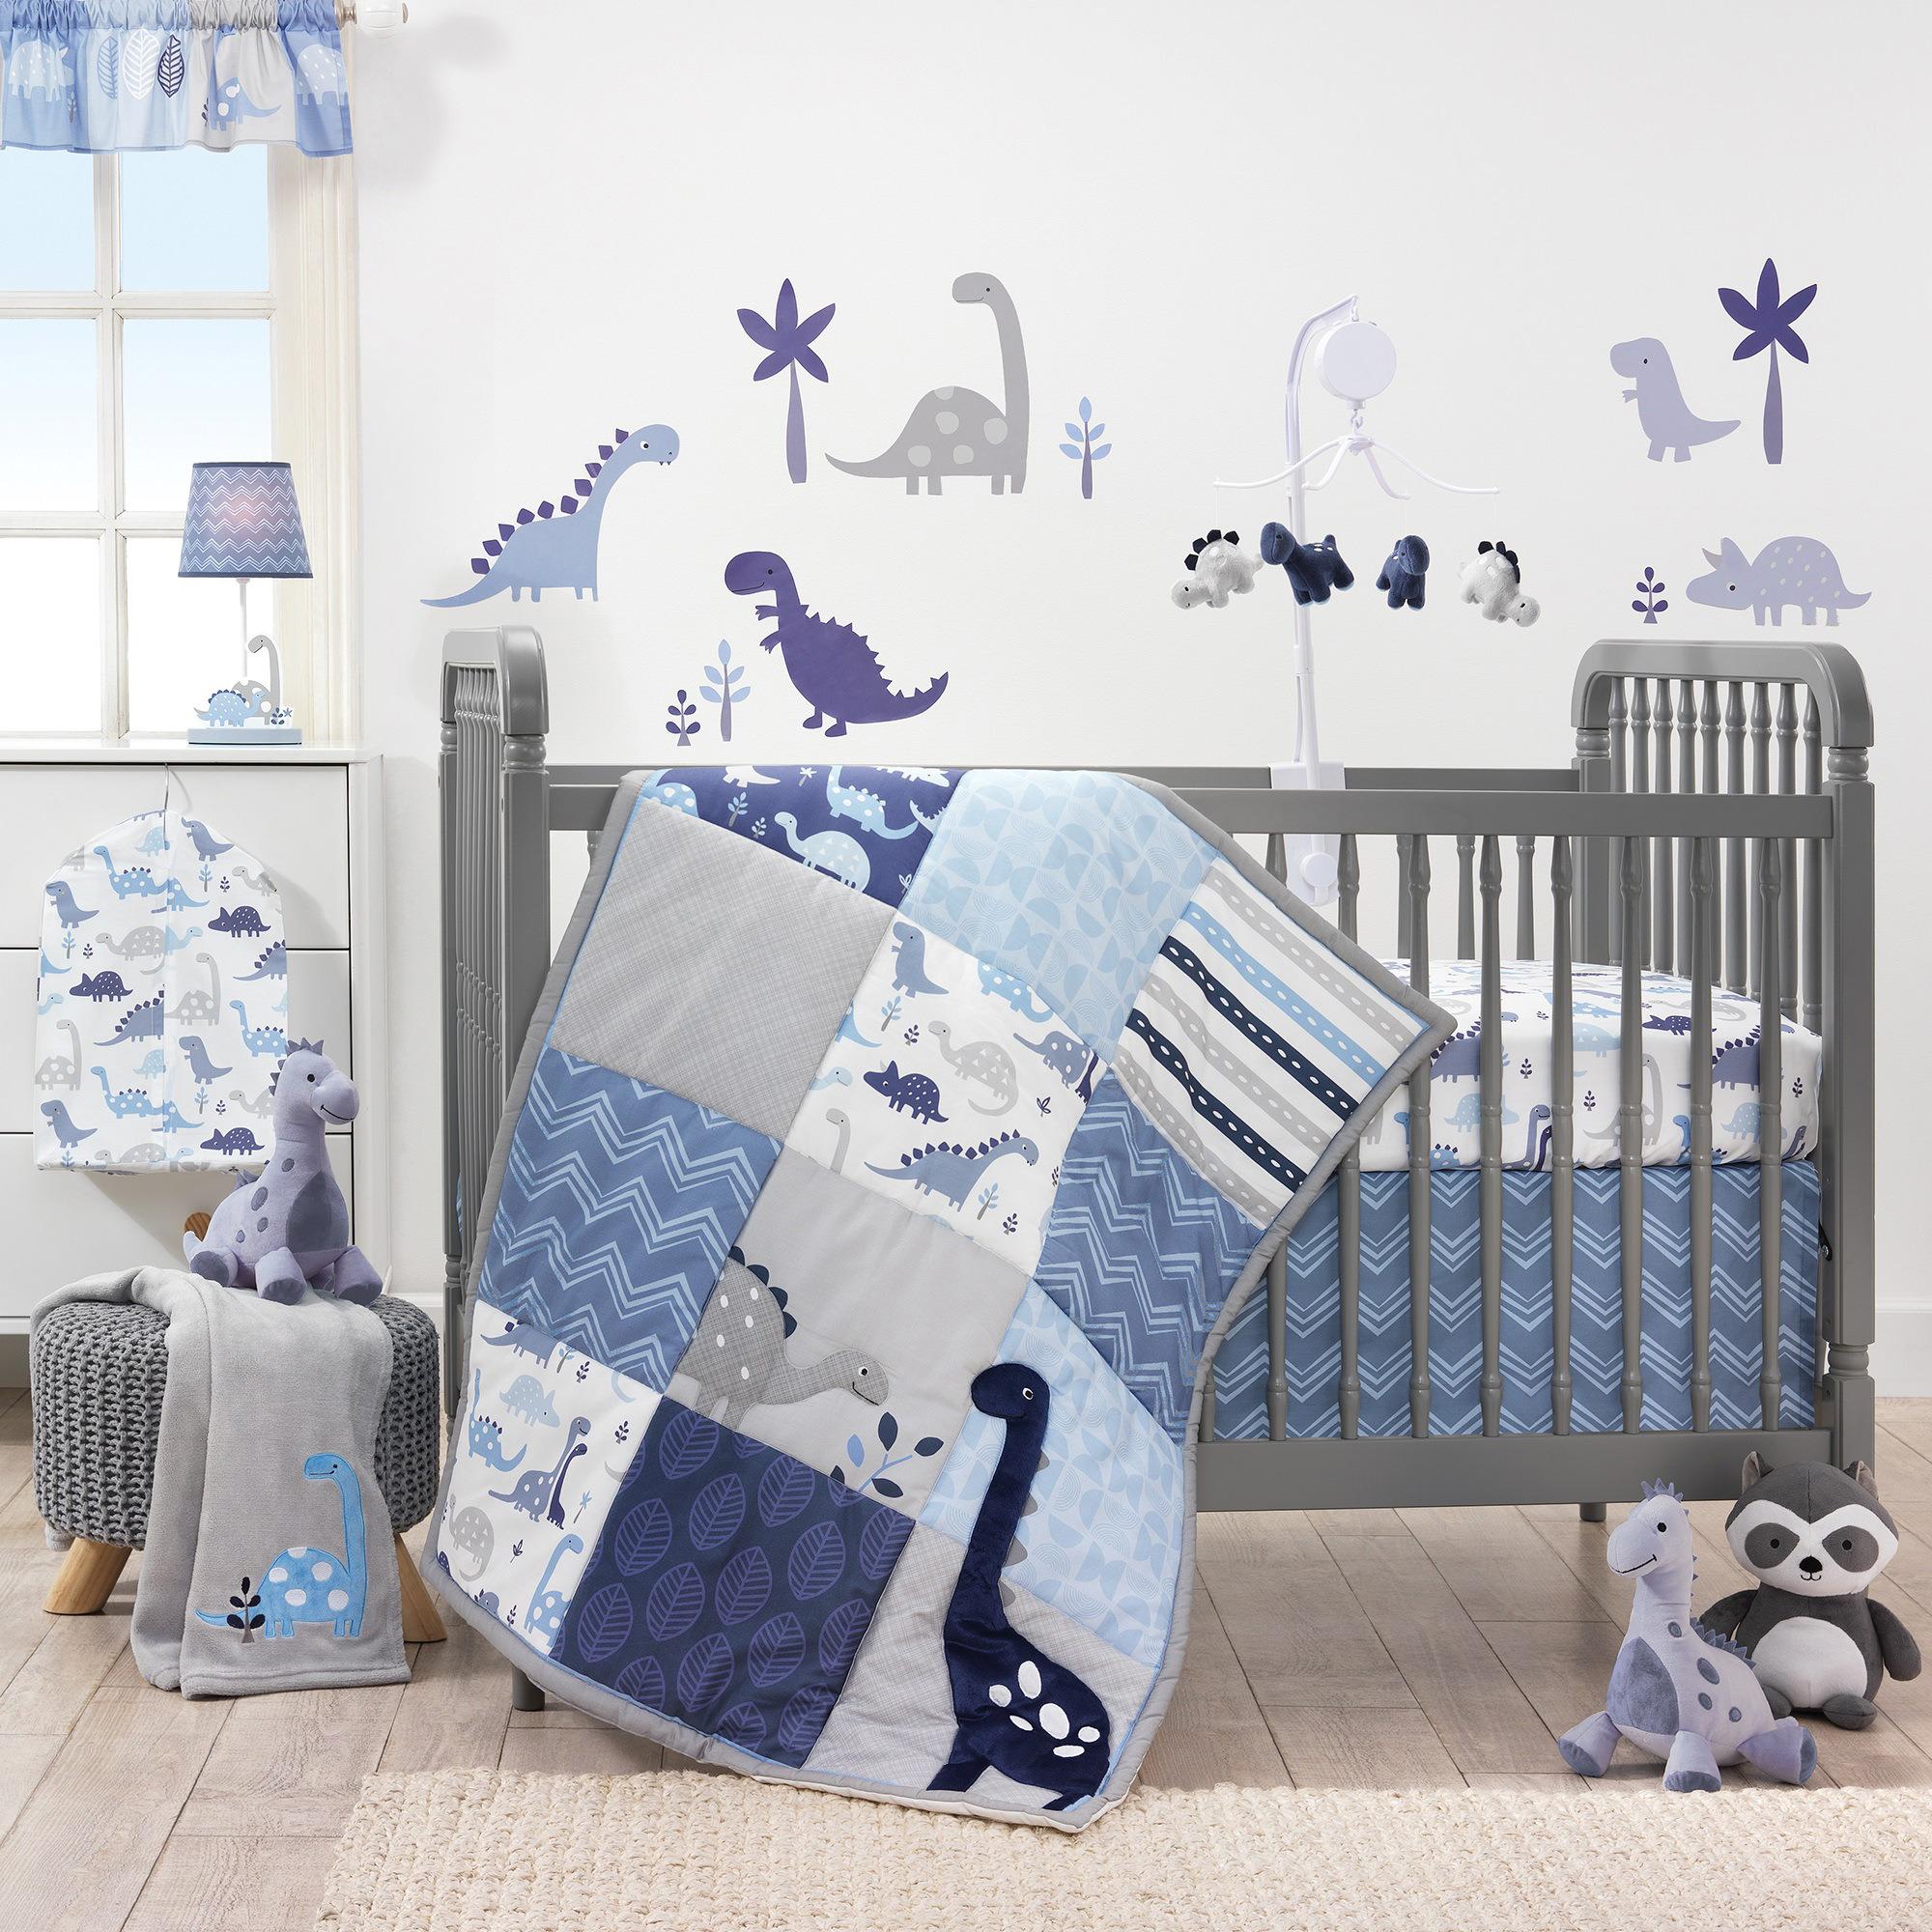 Bedtime Originals Roar Dinosaur 3 Piece Crib Bedding Set – Walmart Inside Most Up To Date Blended Fabric Mod Dinosaur 3 Piece Wall Hangings Set (View 14 of 20)